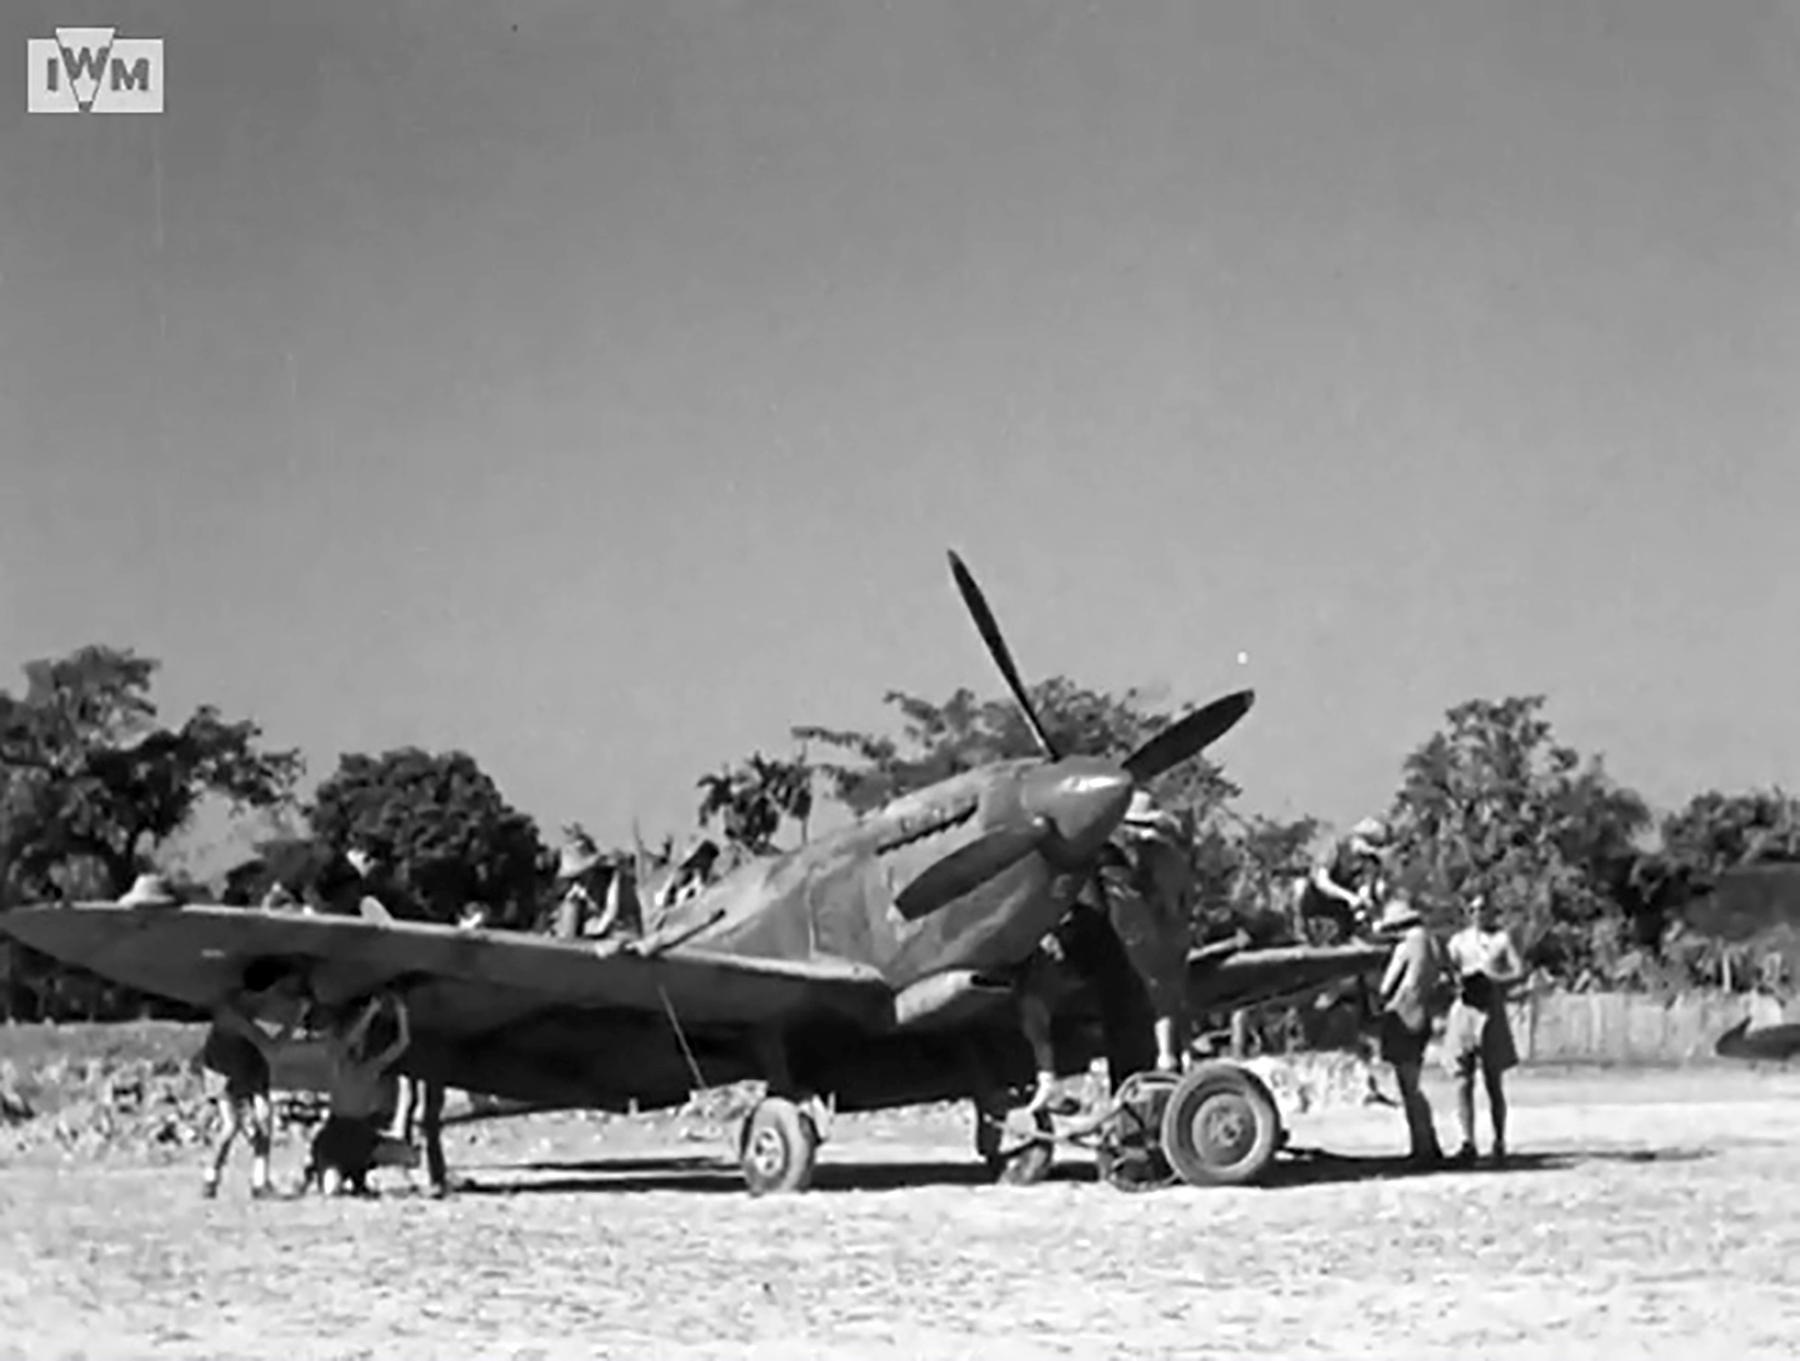 Spitfire VIII RAF 136Sqn HM being prepared for take off from Rumkhapalong Bangladesh CBI 1944 IWM 01